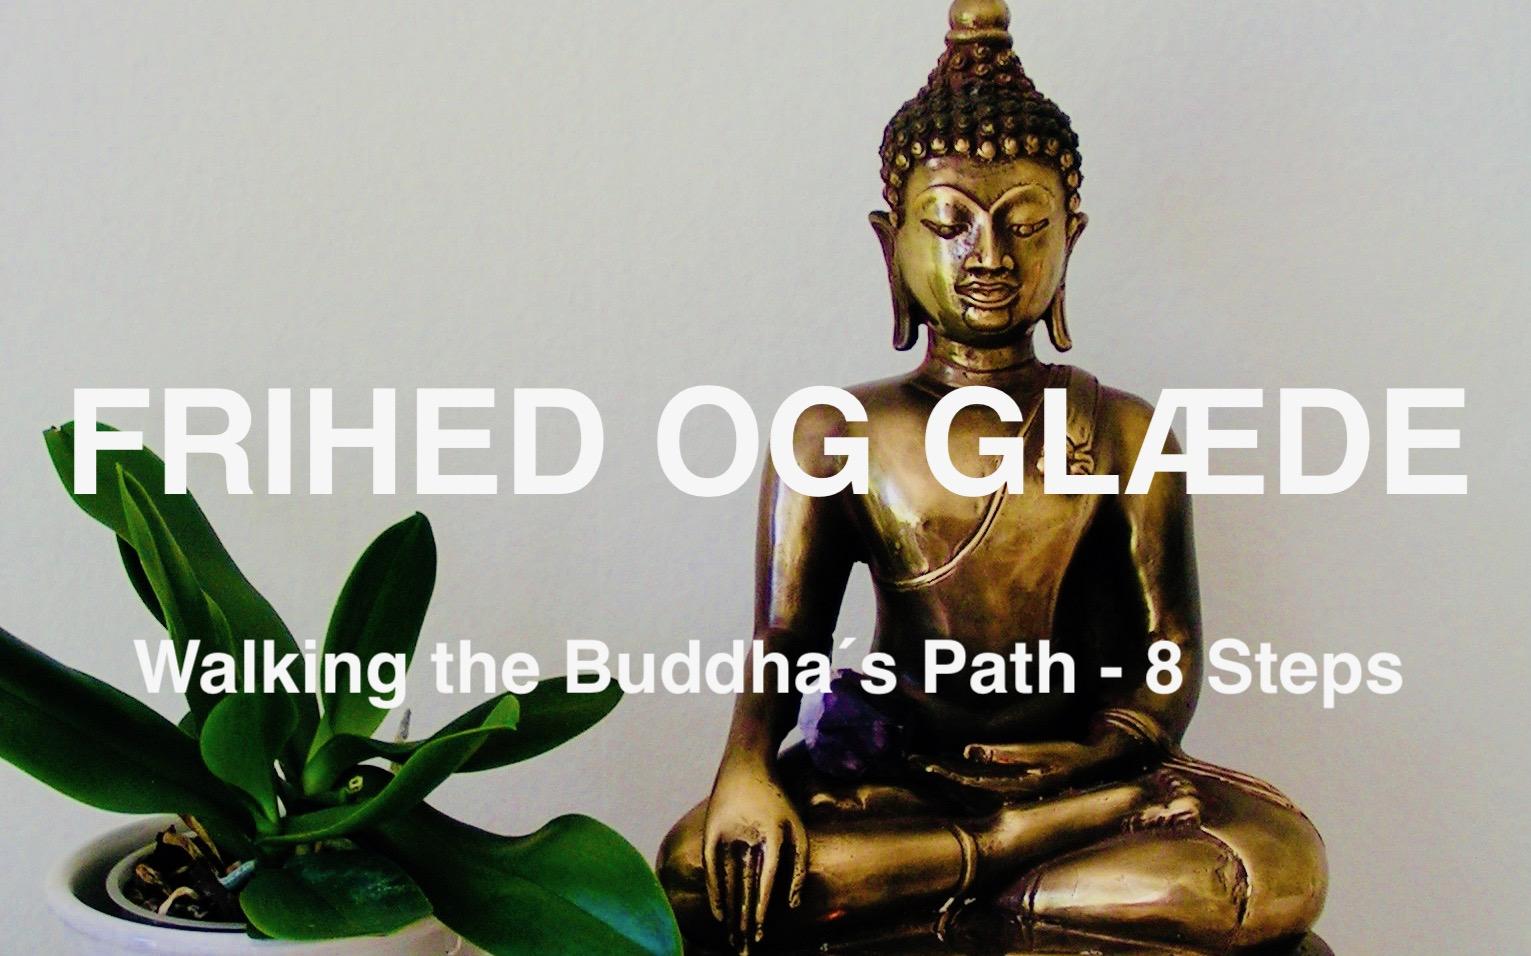 Messing Buddha sammen med en plante